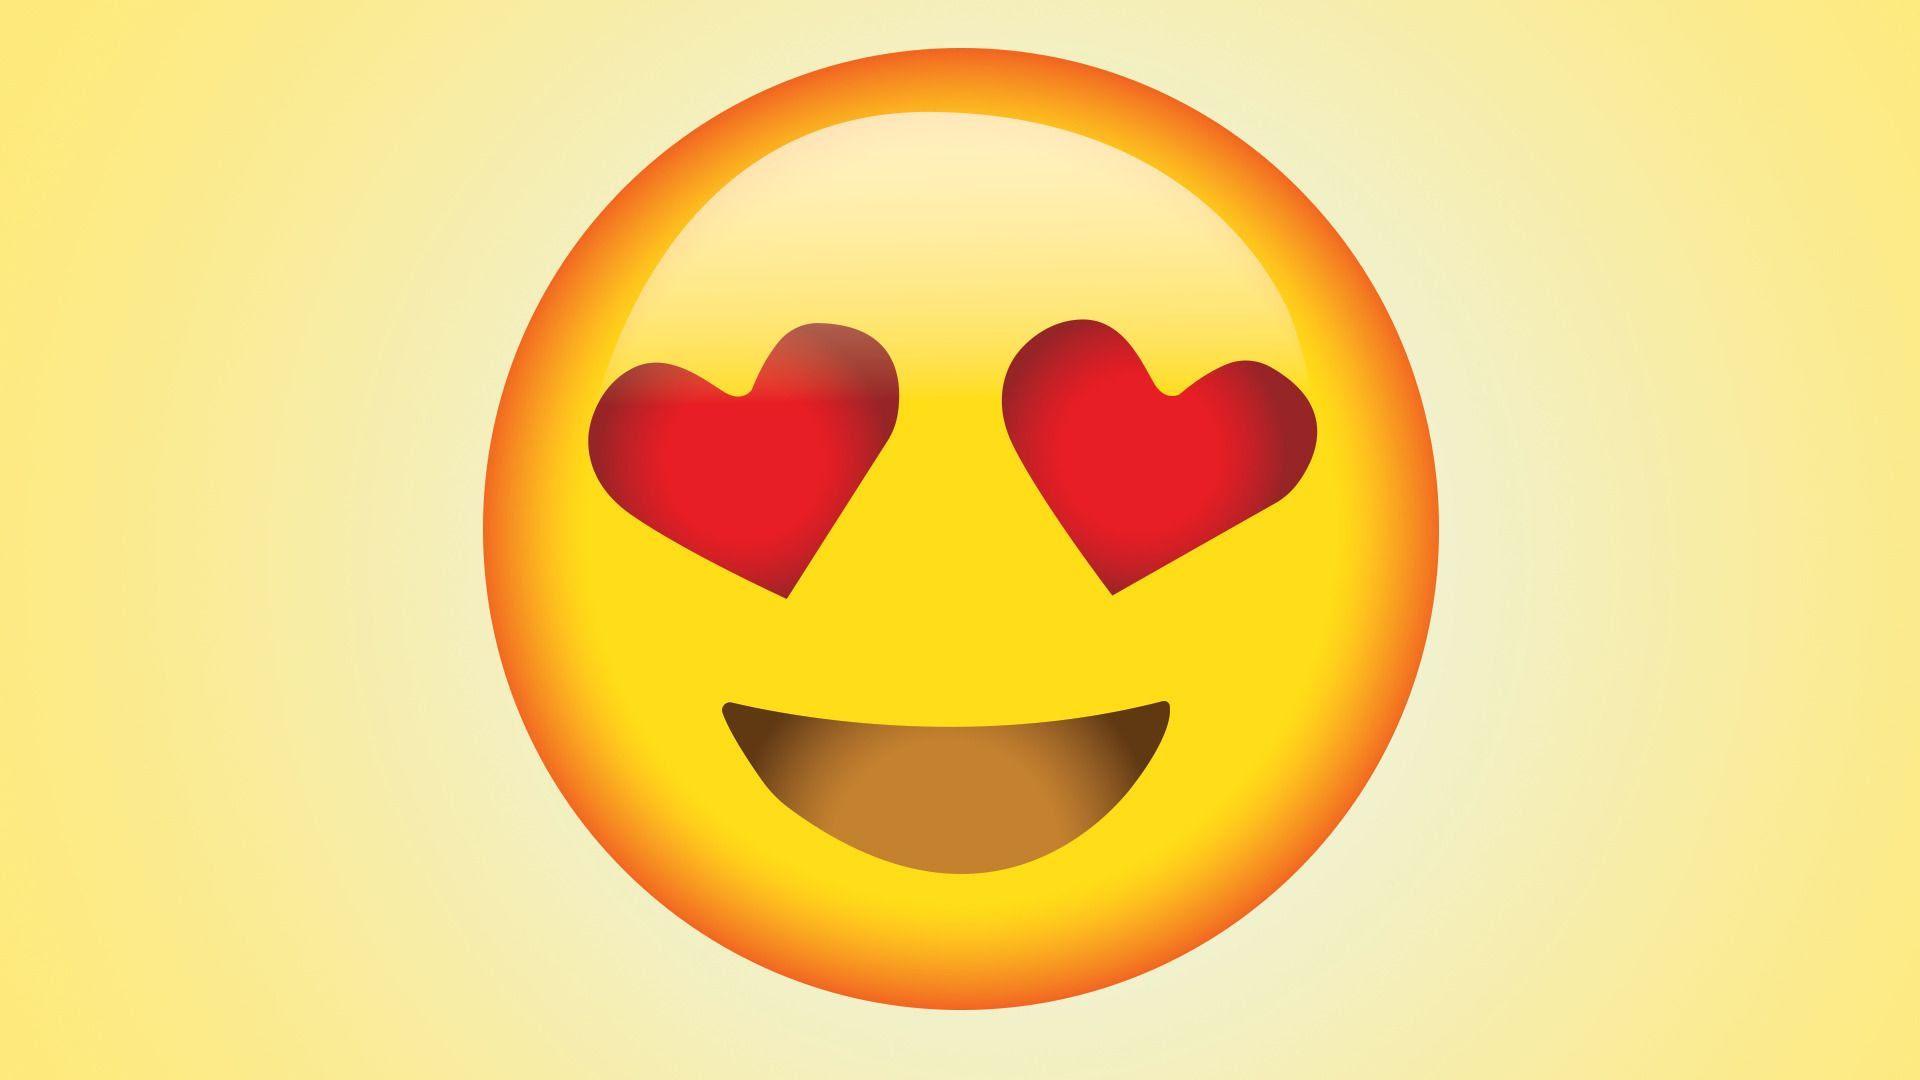 Download Emoji Wallpaper Hd 1080p Wallpaper Prambanan